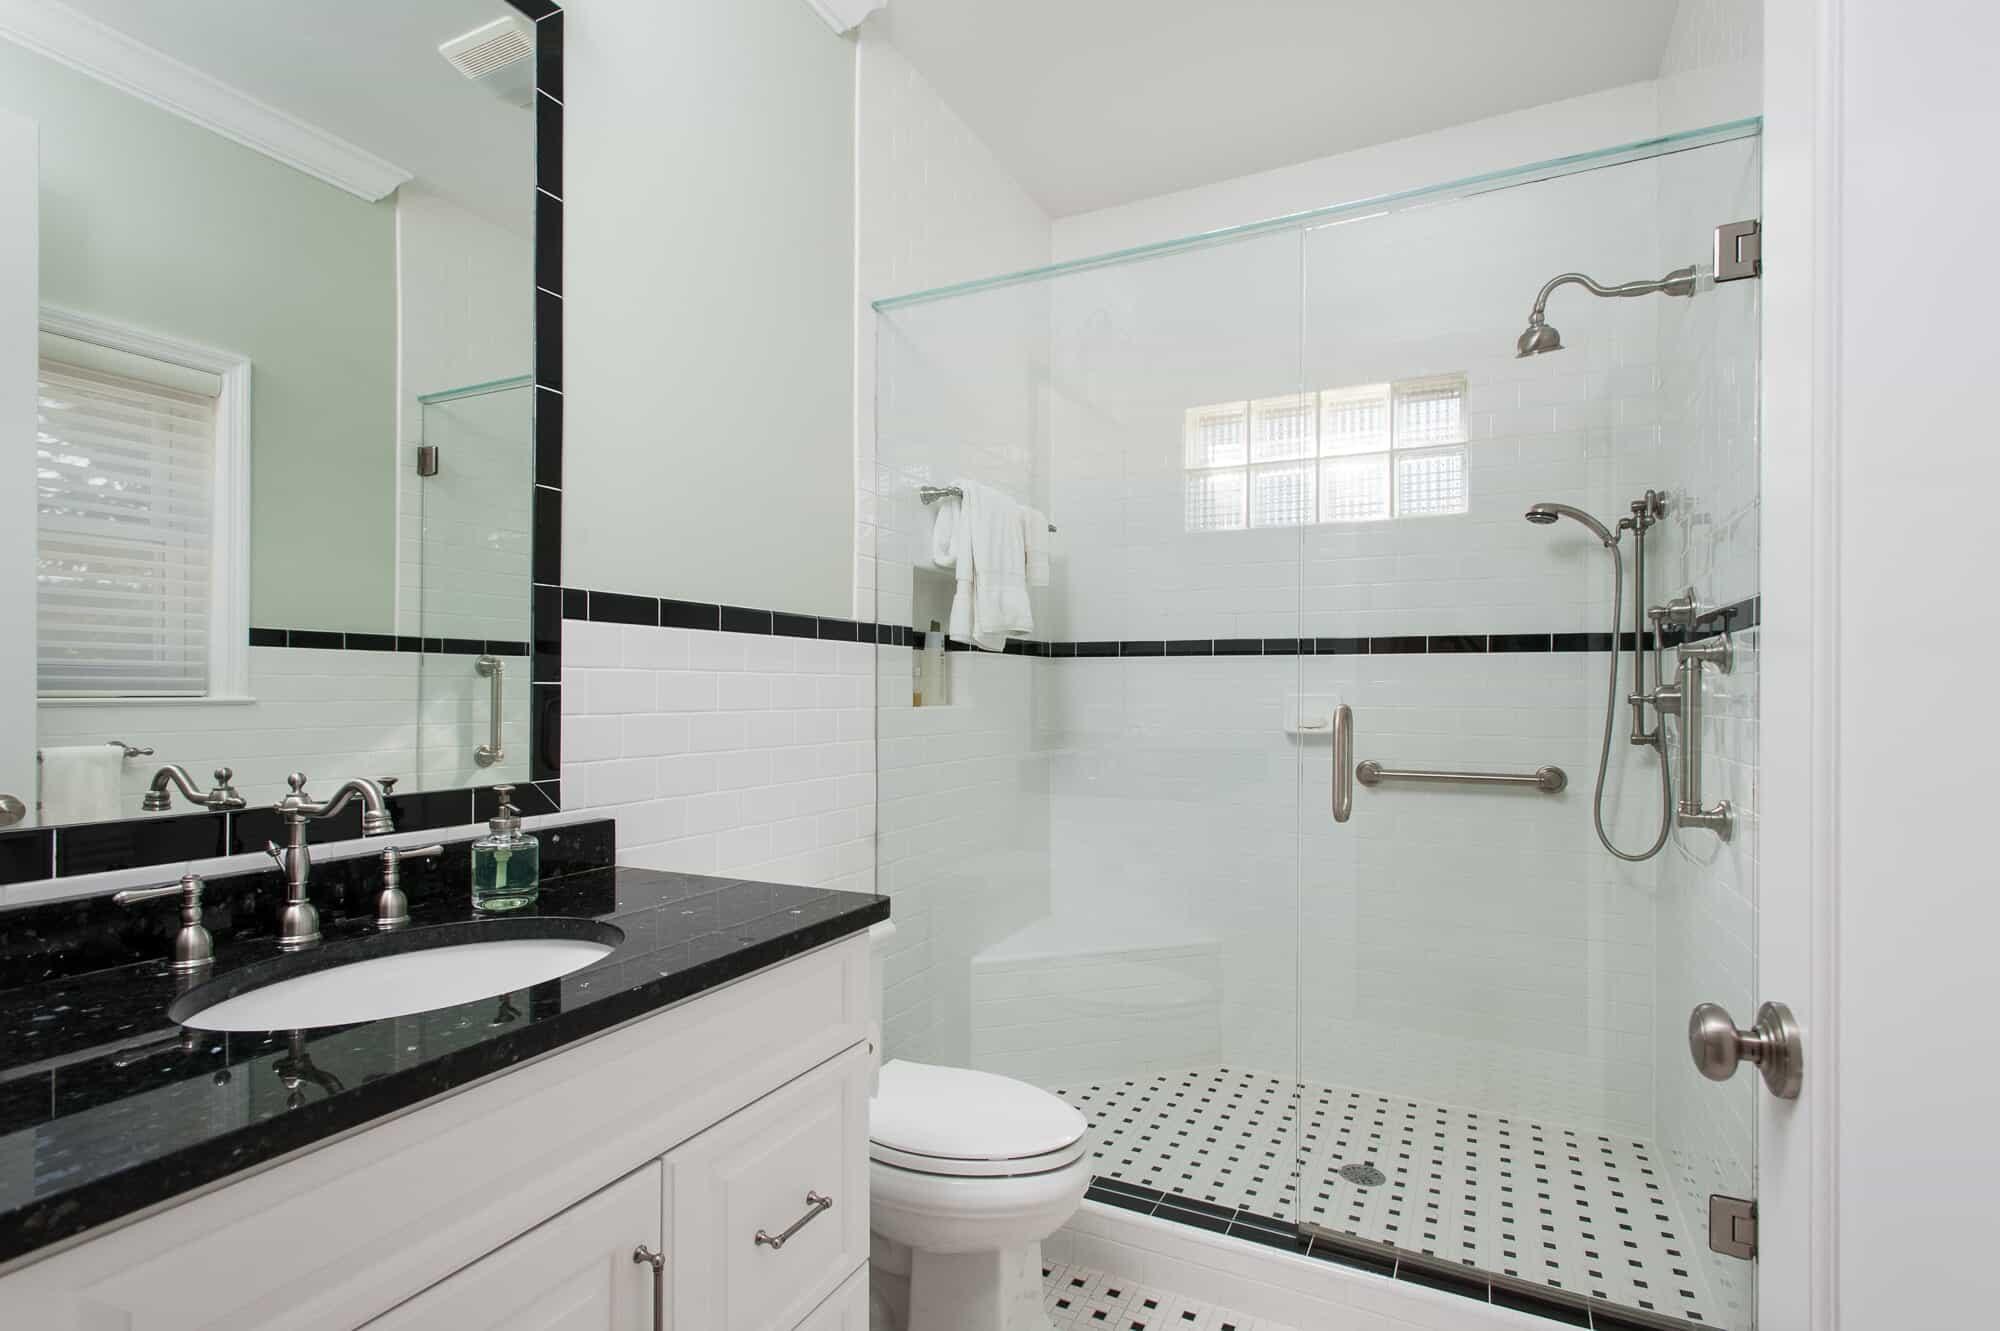 Bathroom Remodeling Contractors Clearwater Fl | Bathroom ...